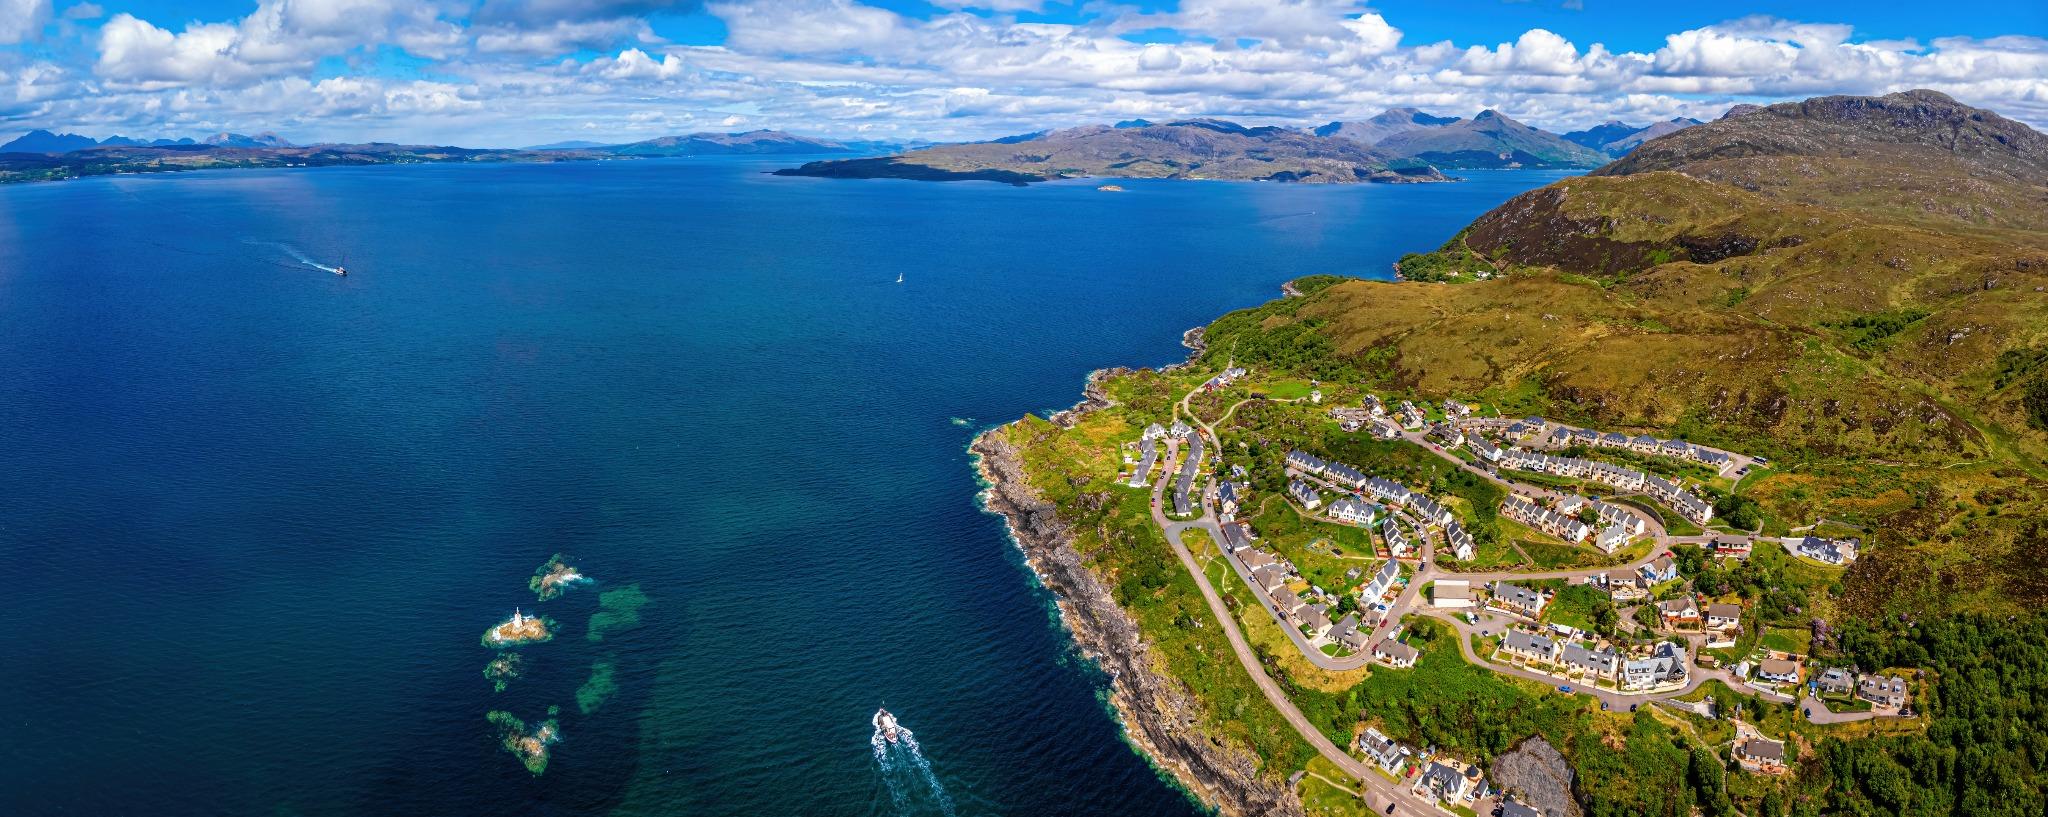 Where is Lochaber located in Scotland?